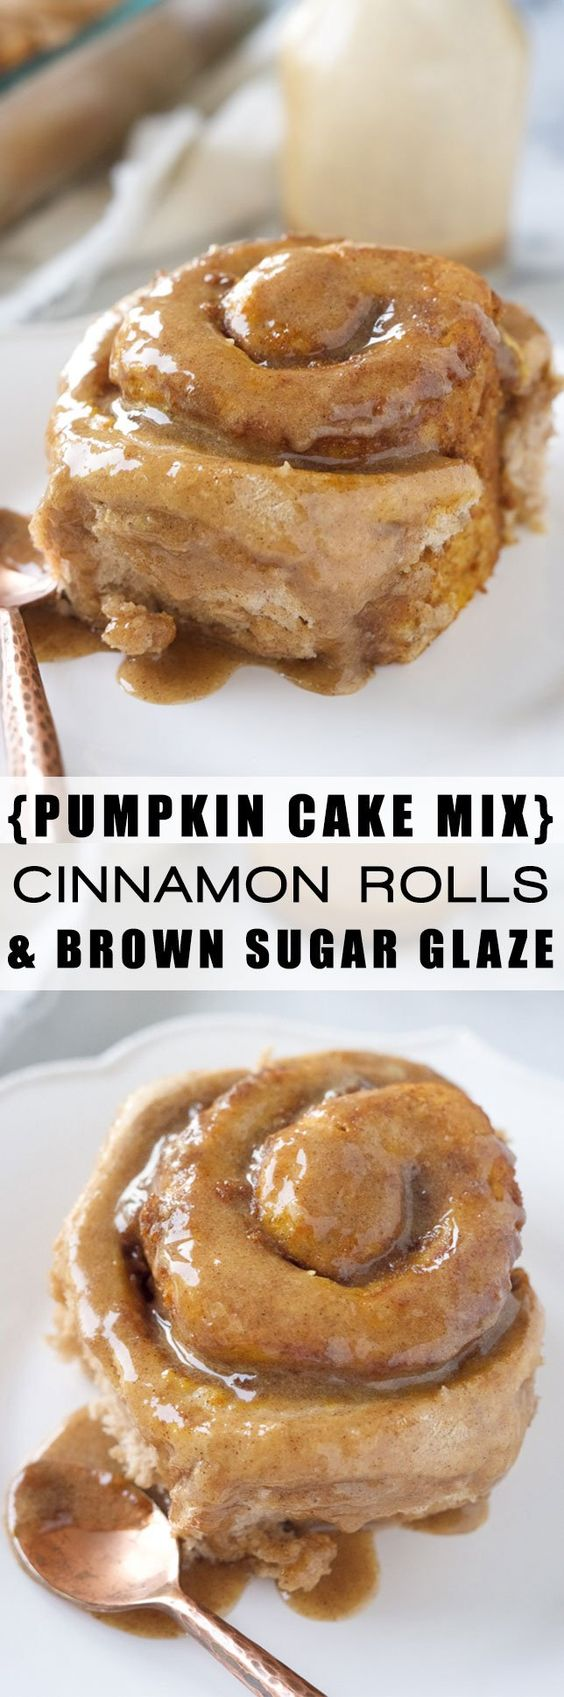 pumpkin cinnamon rolls families cinnamon roll cakes roll cakes roll ...